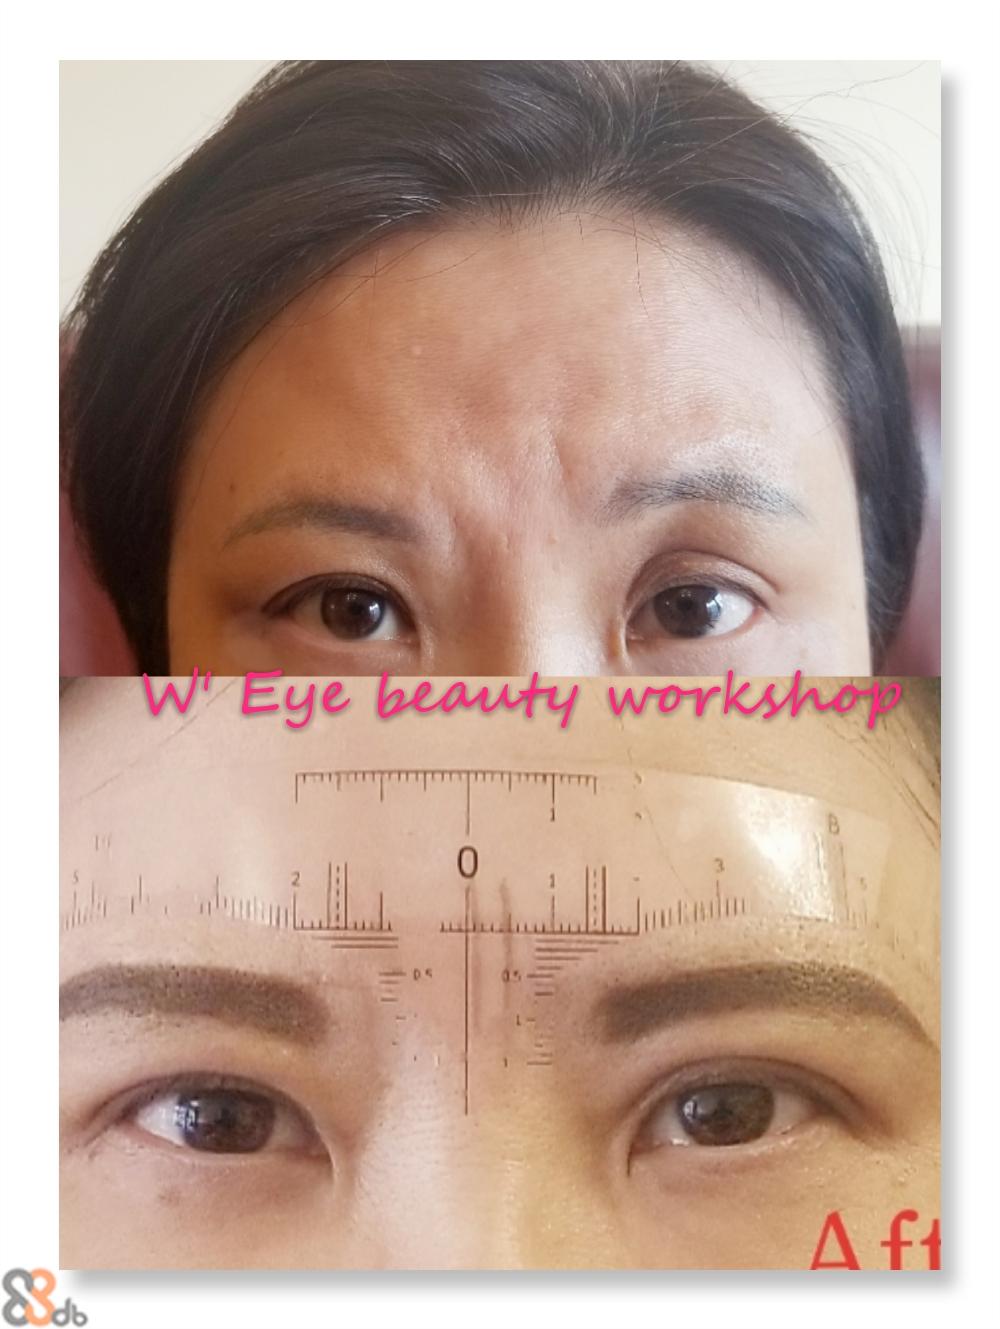 ye beanuty workshop Lilul.lulili  eyebrow,face,forehead,cheek,skin